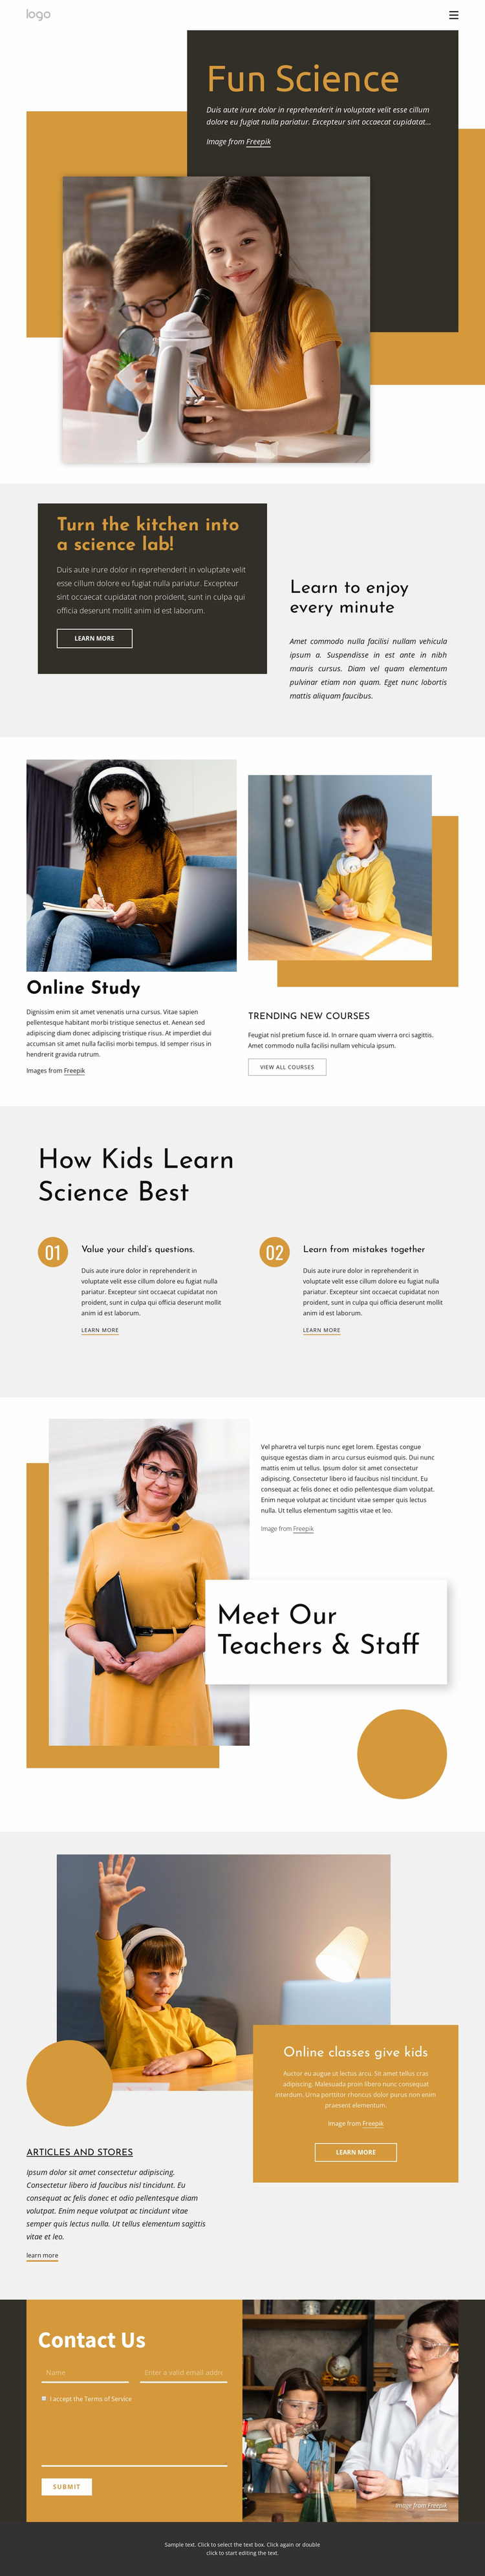 Cool science project Website Design